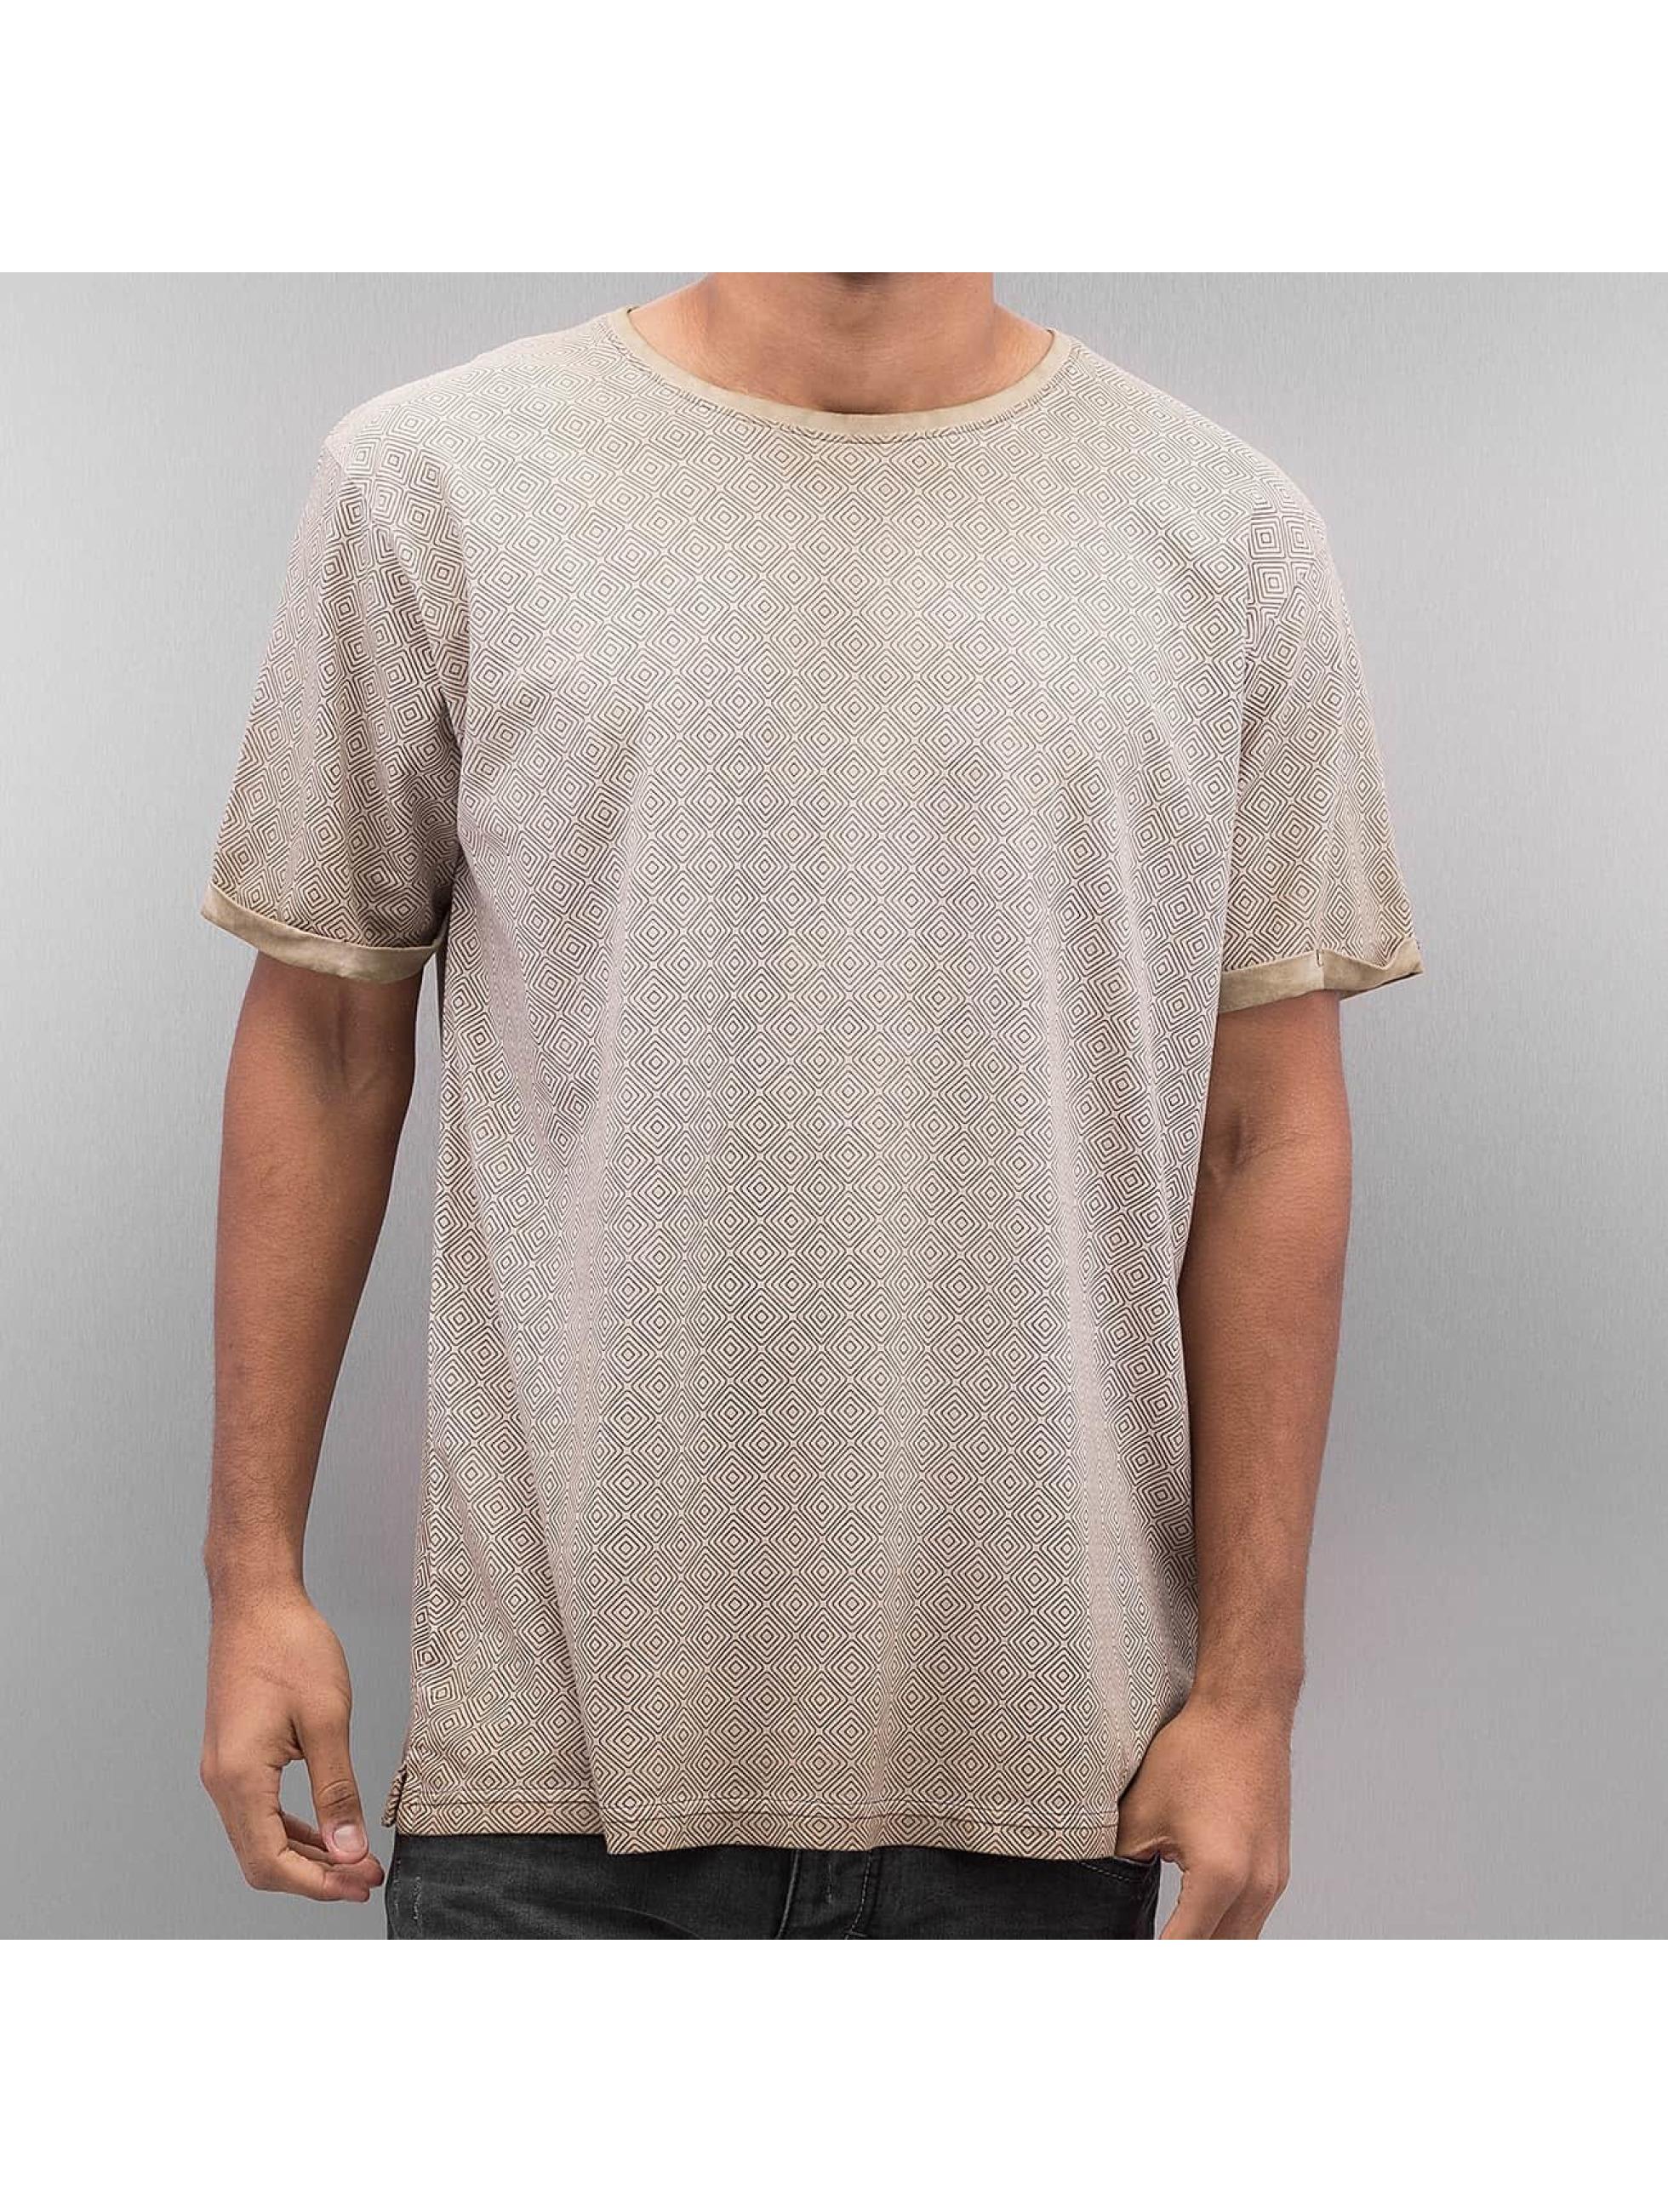 DEF T-Shirt Karlo brown